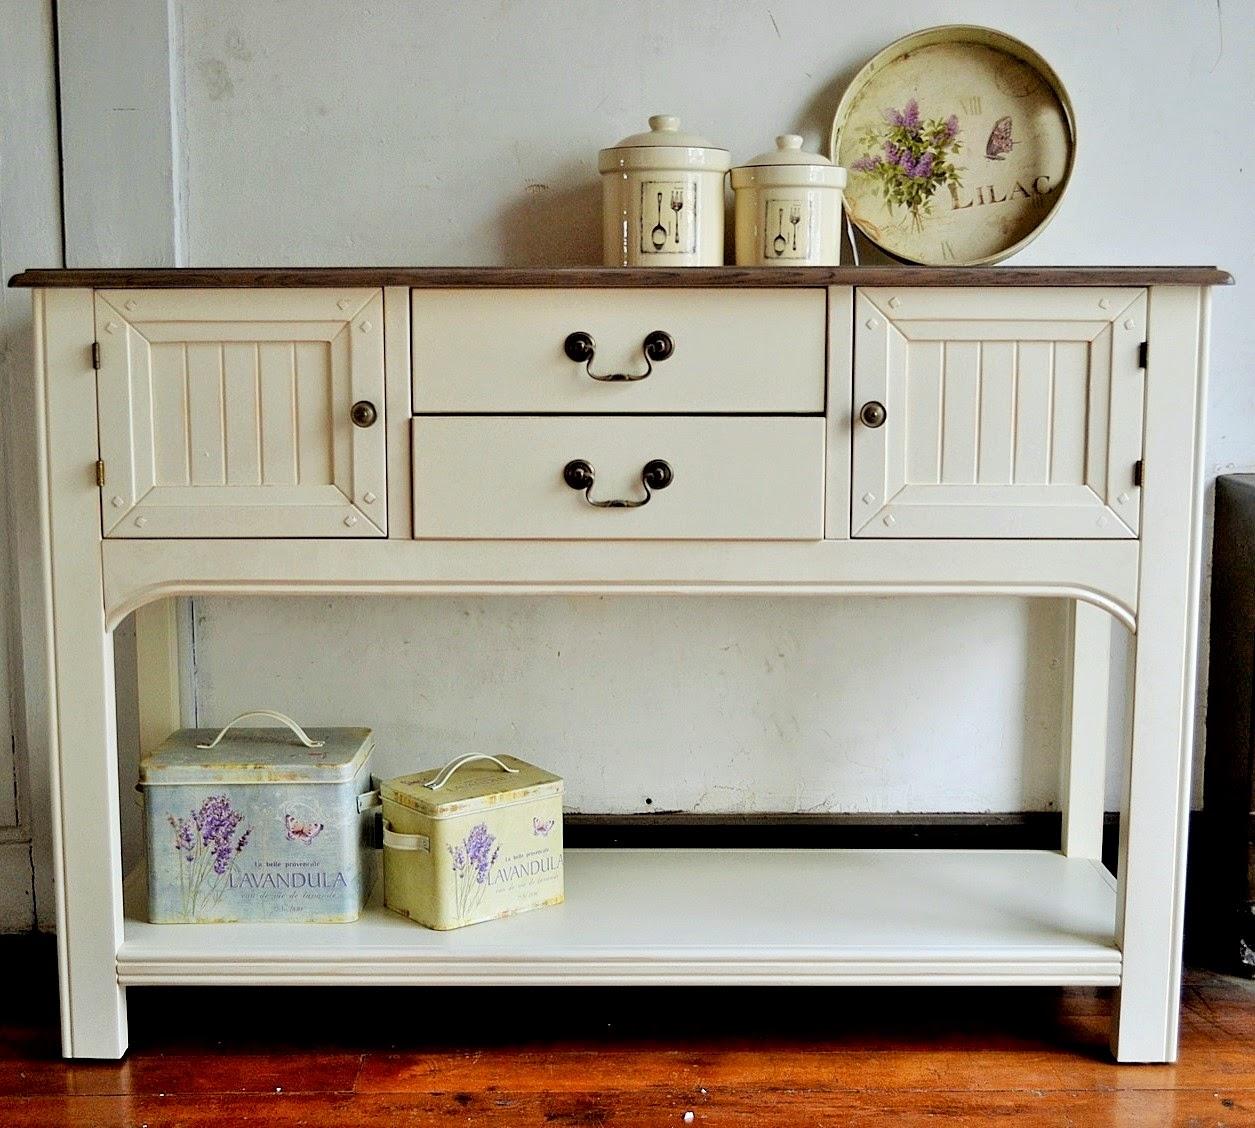 Paz montealegre decoraci n nueva linea de muebles provenzal for Muebles estilo provenzal